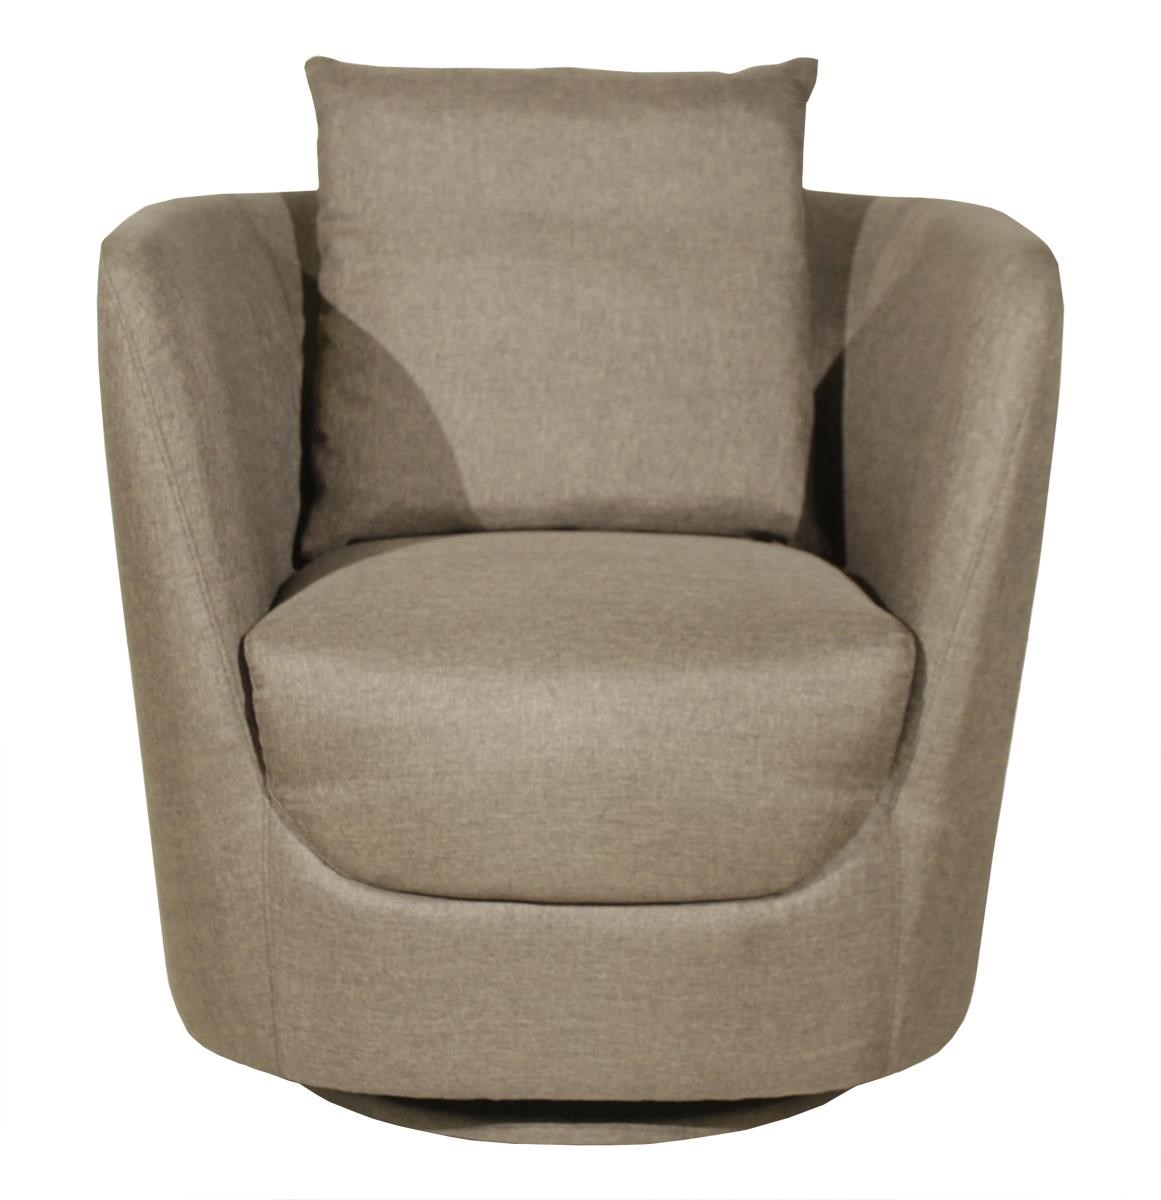 Boliya USA Carver Swivel Chair - Item Number: CO-391-CHAIR CARVER